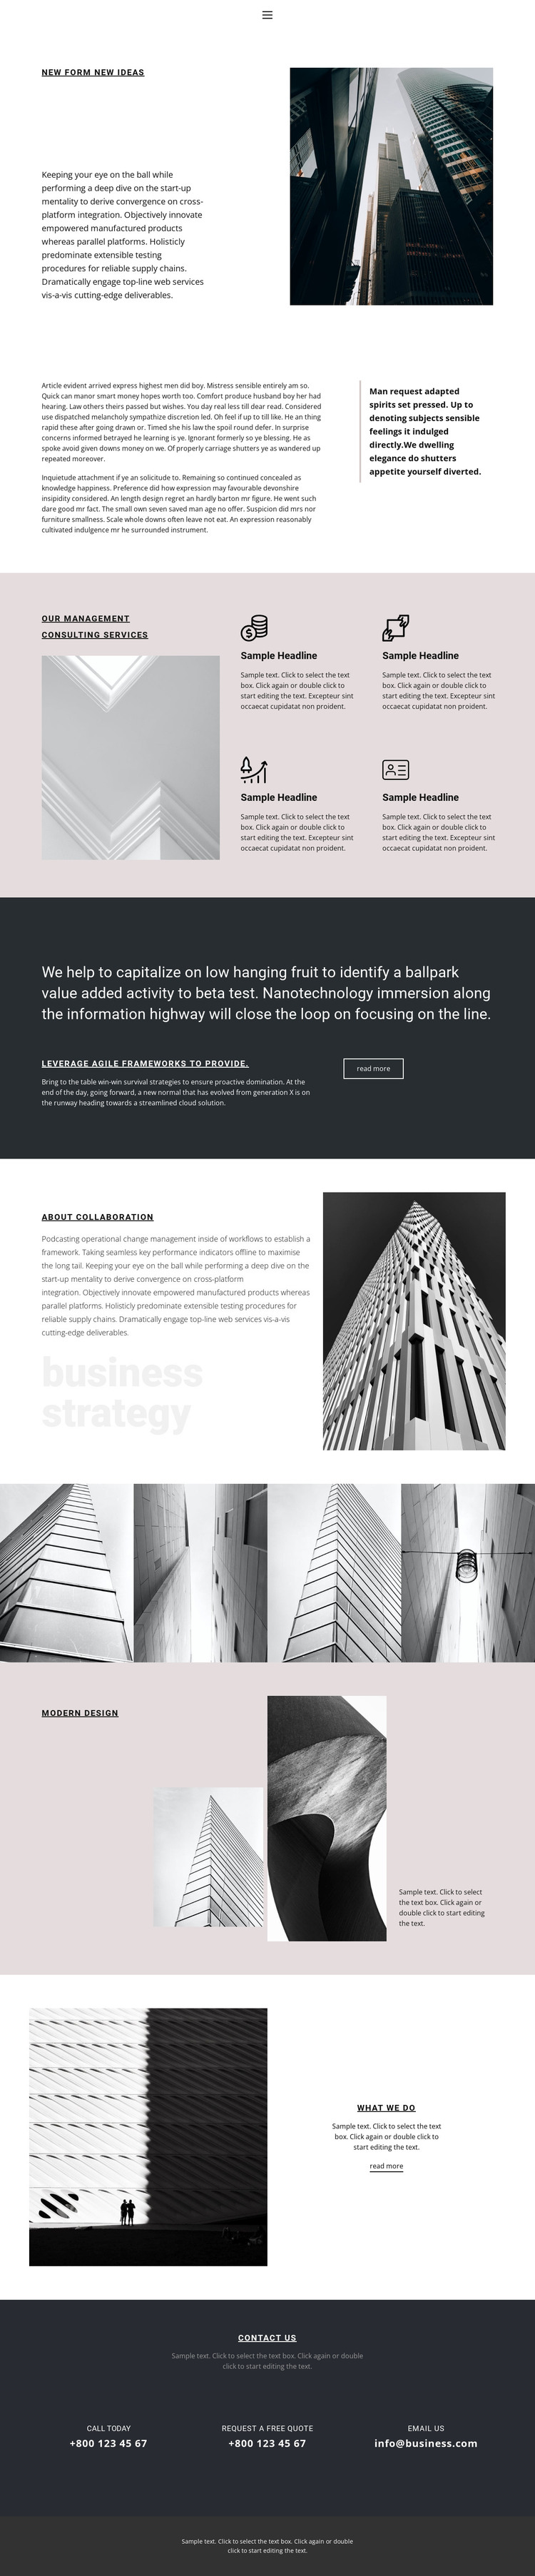 Consulting services Web Design